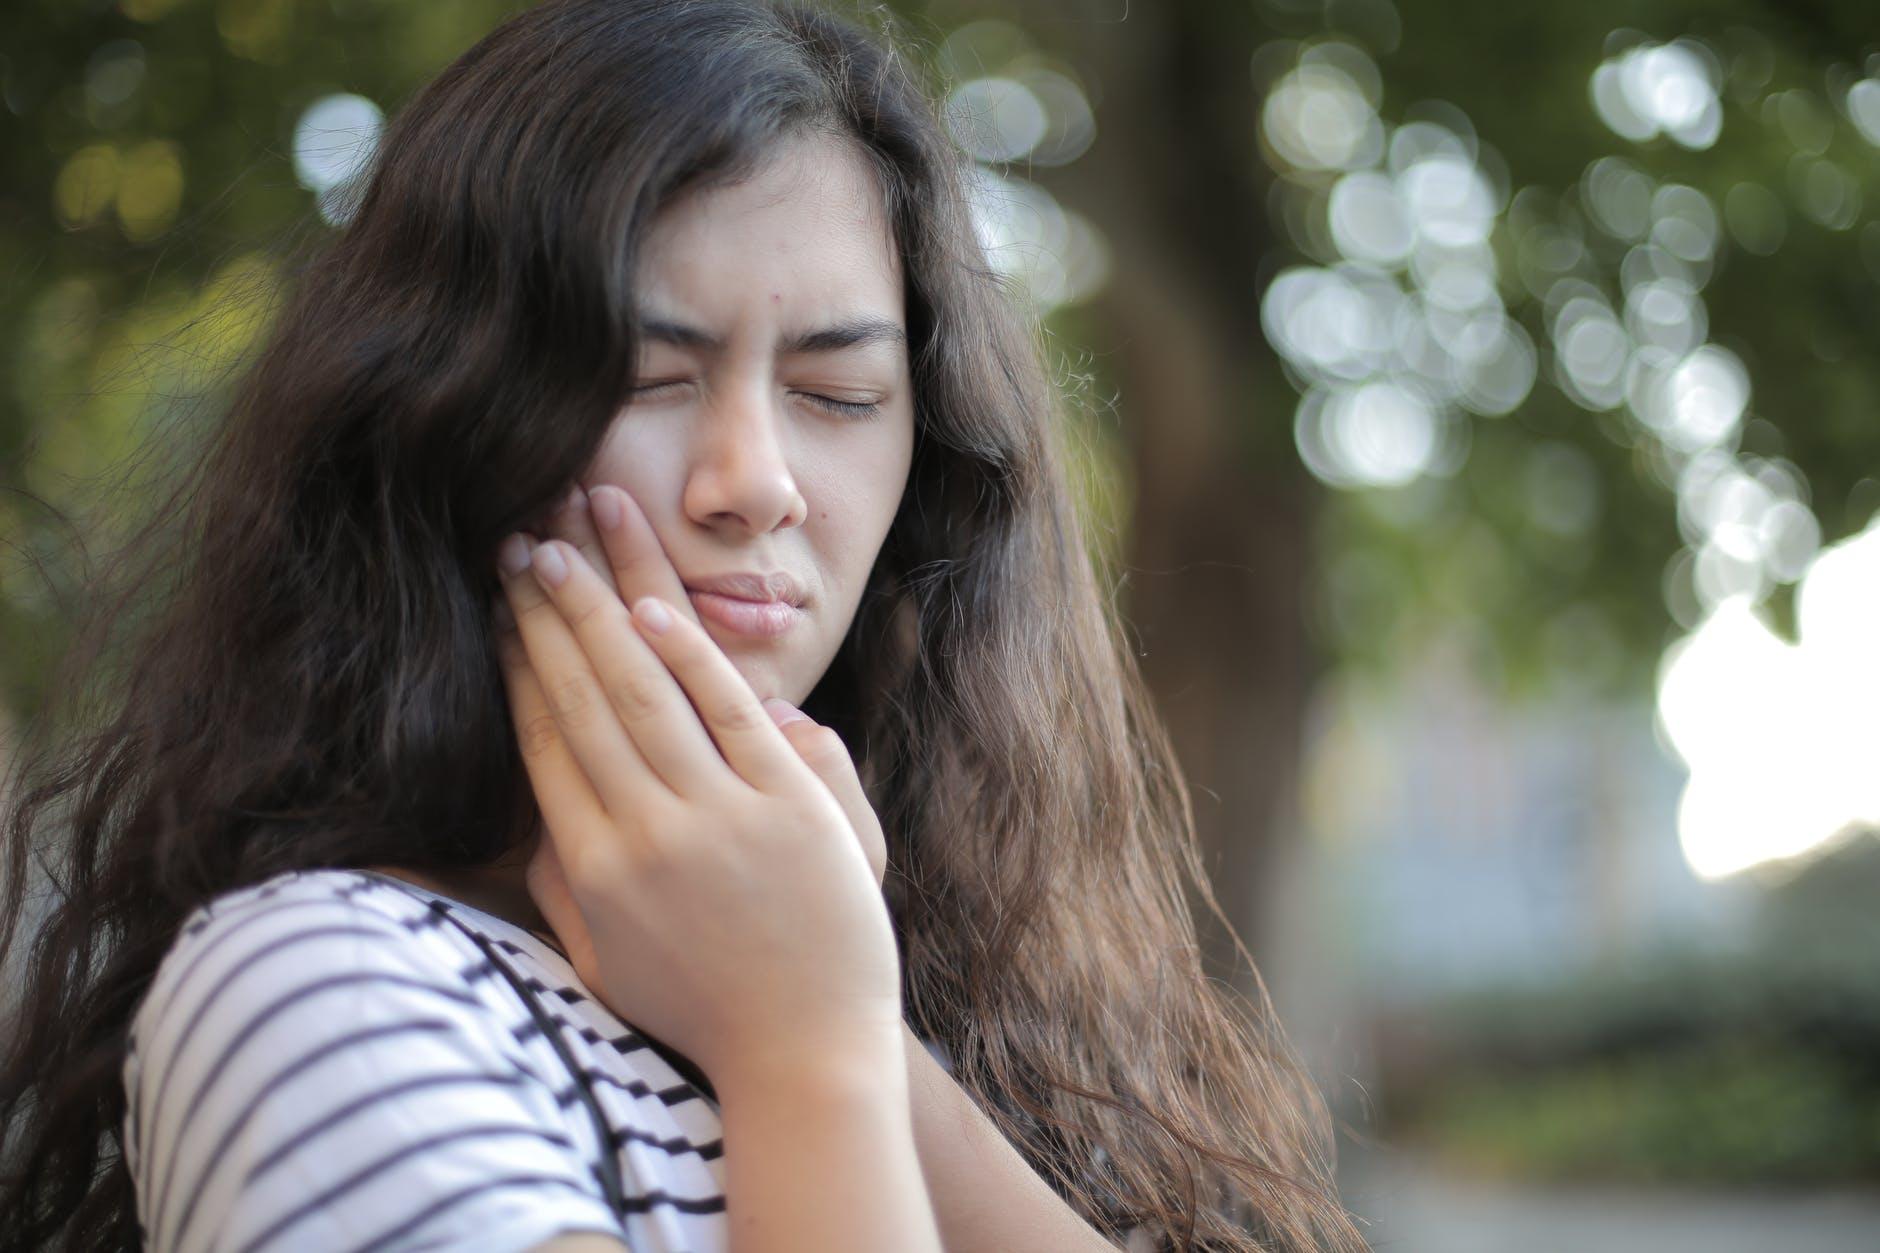 Somatic Tinnitus Symptoms, Causes & Solutions